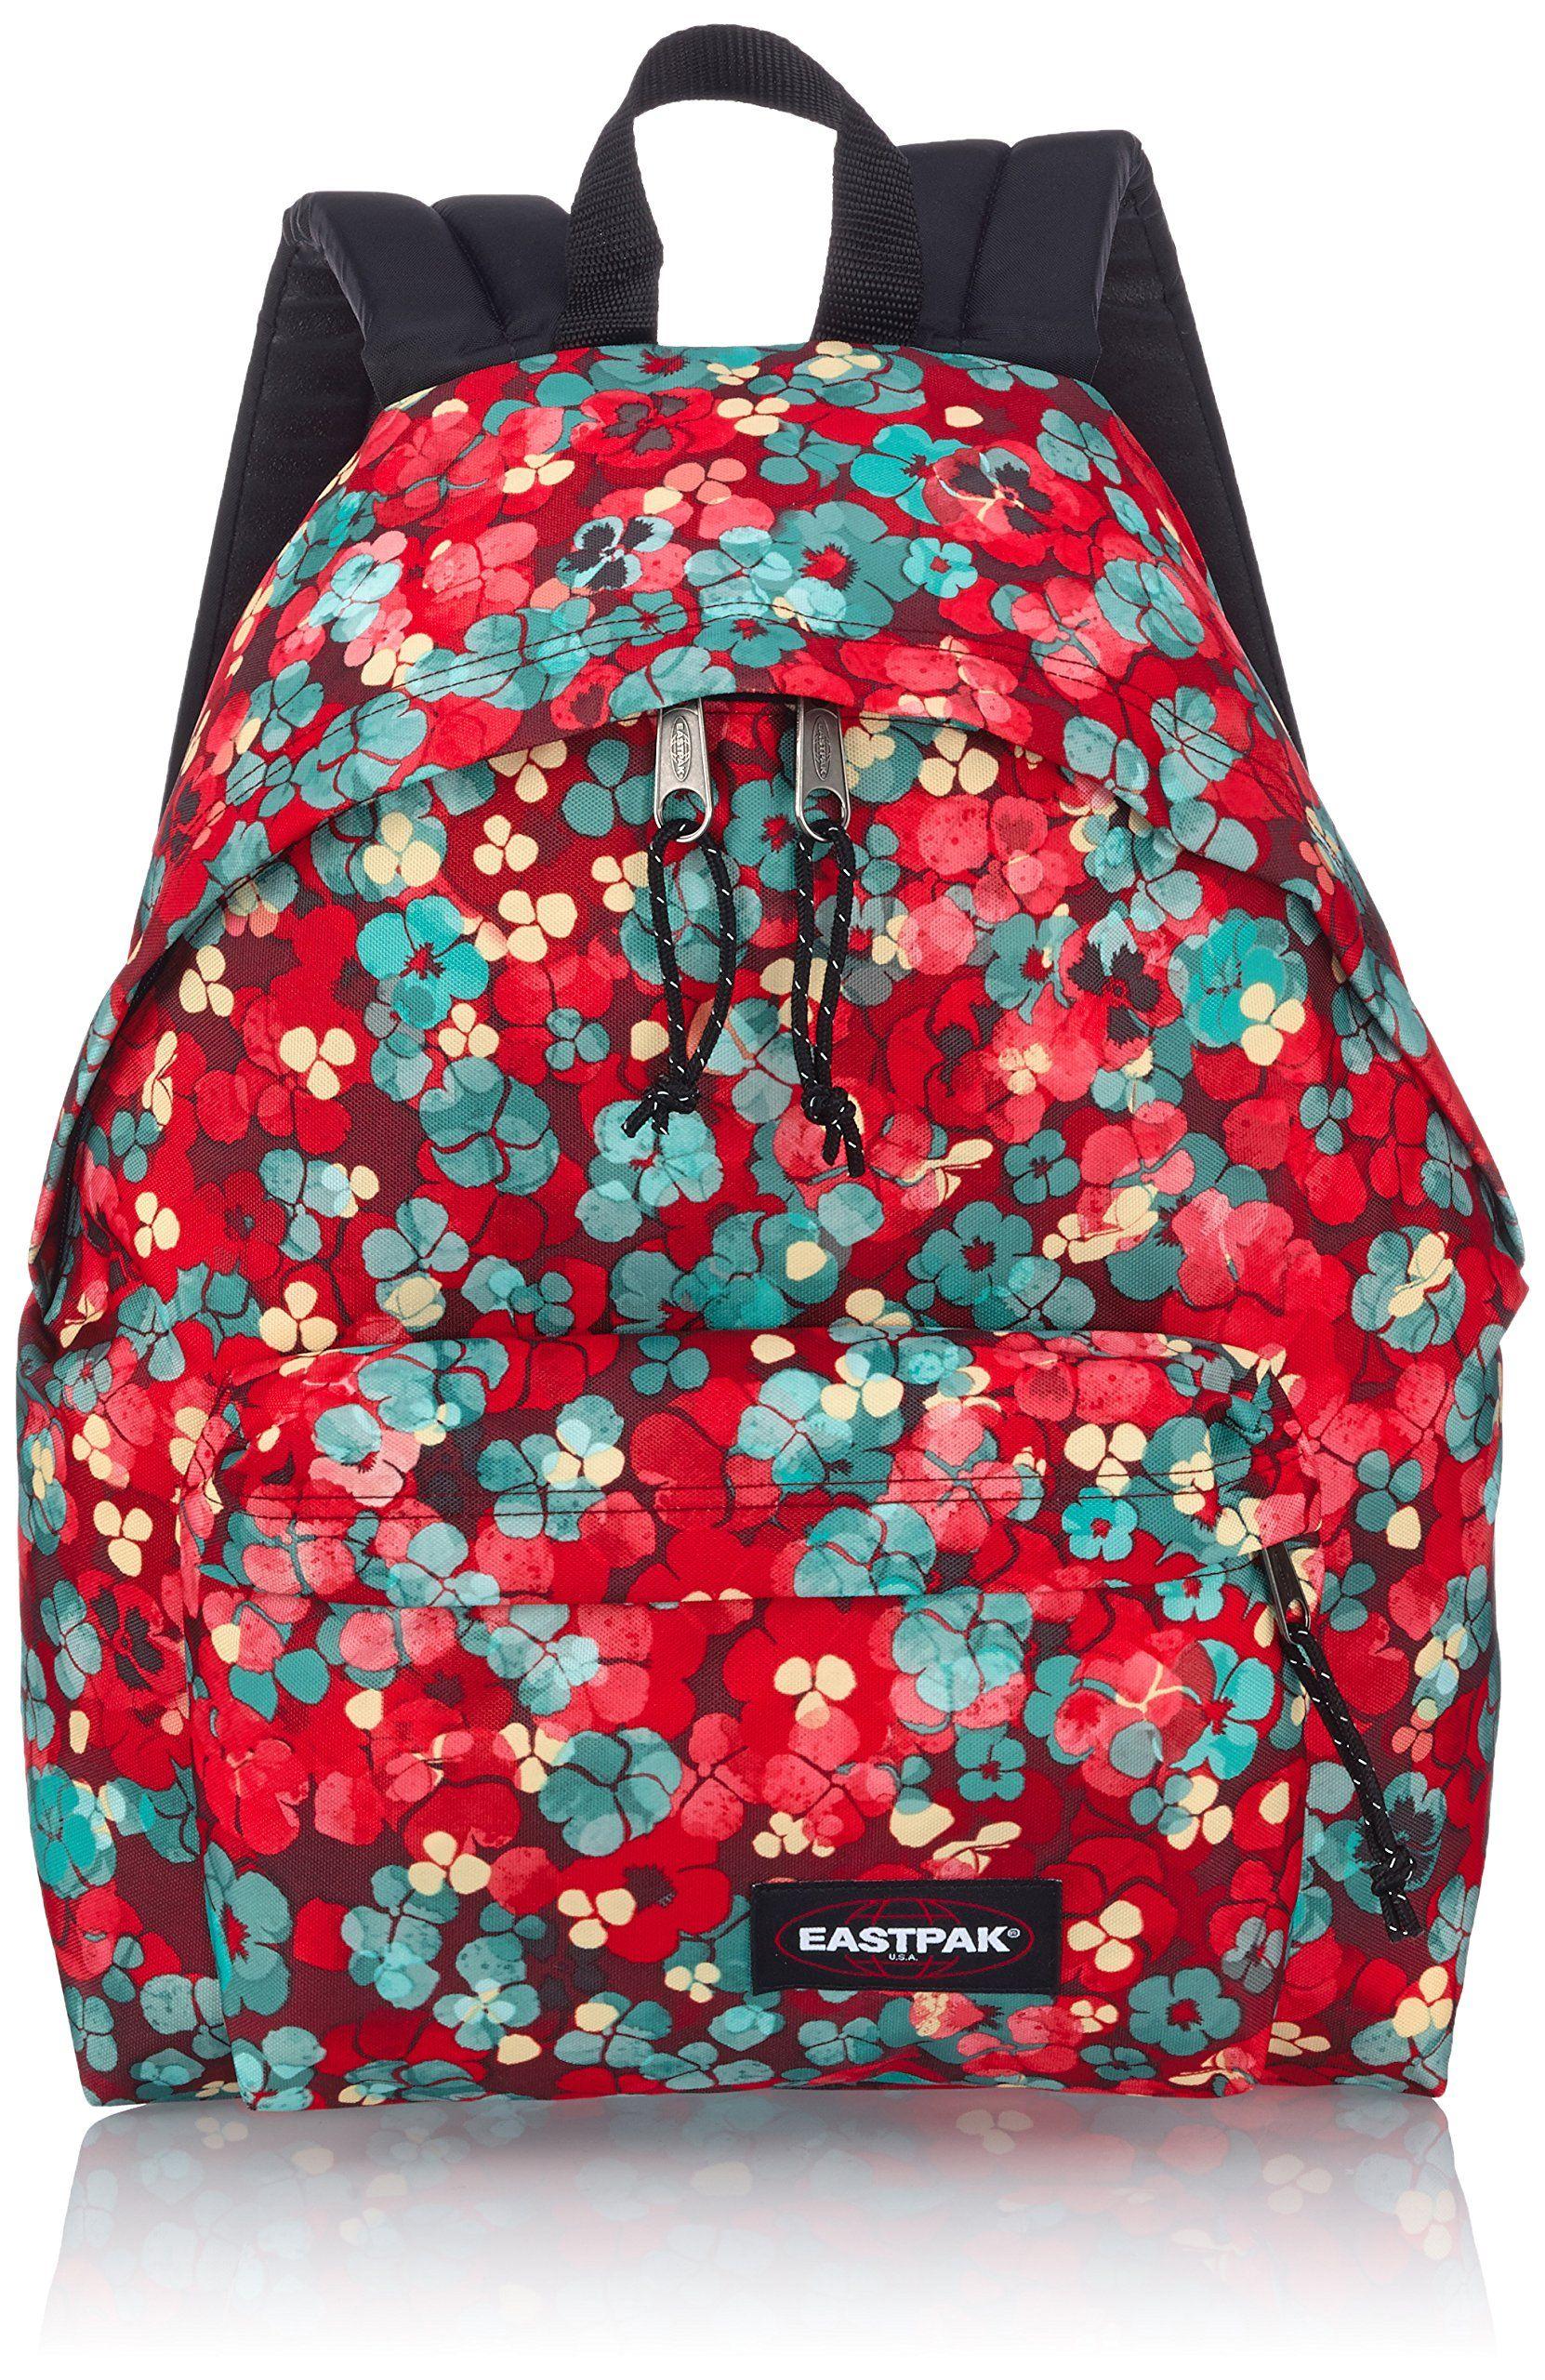 Eastpak Casual Daypack Pak'r Multicolour 24 0 L EK62034H